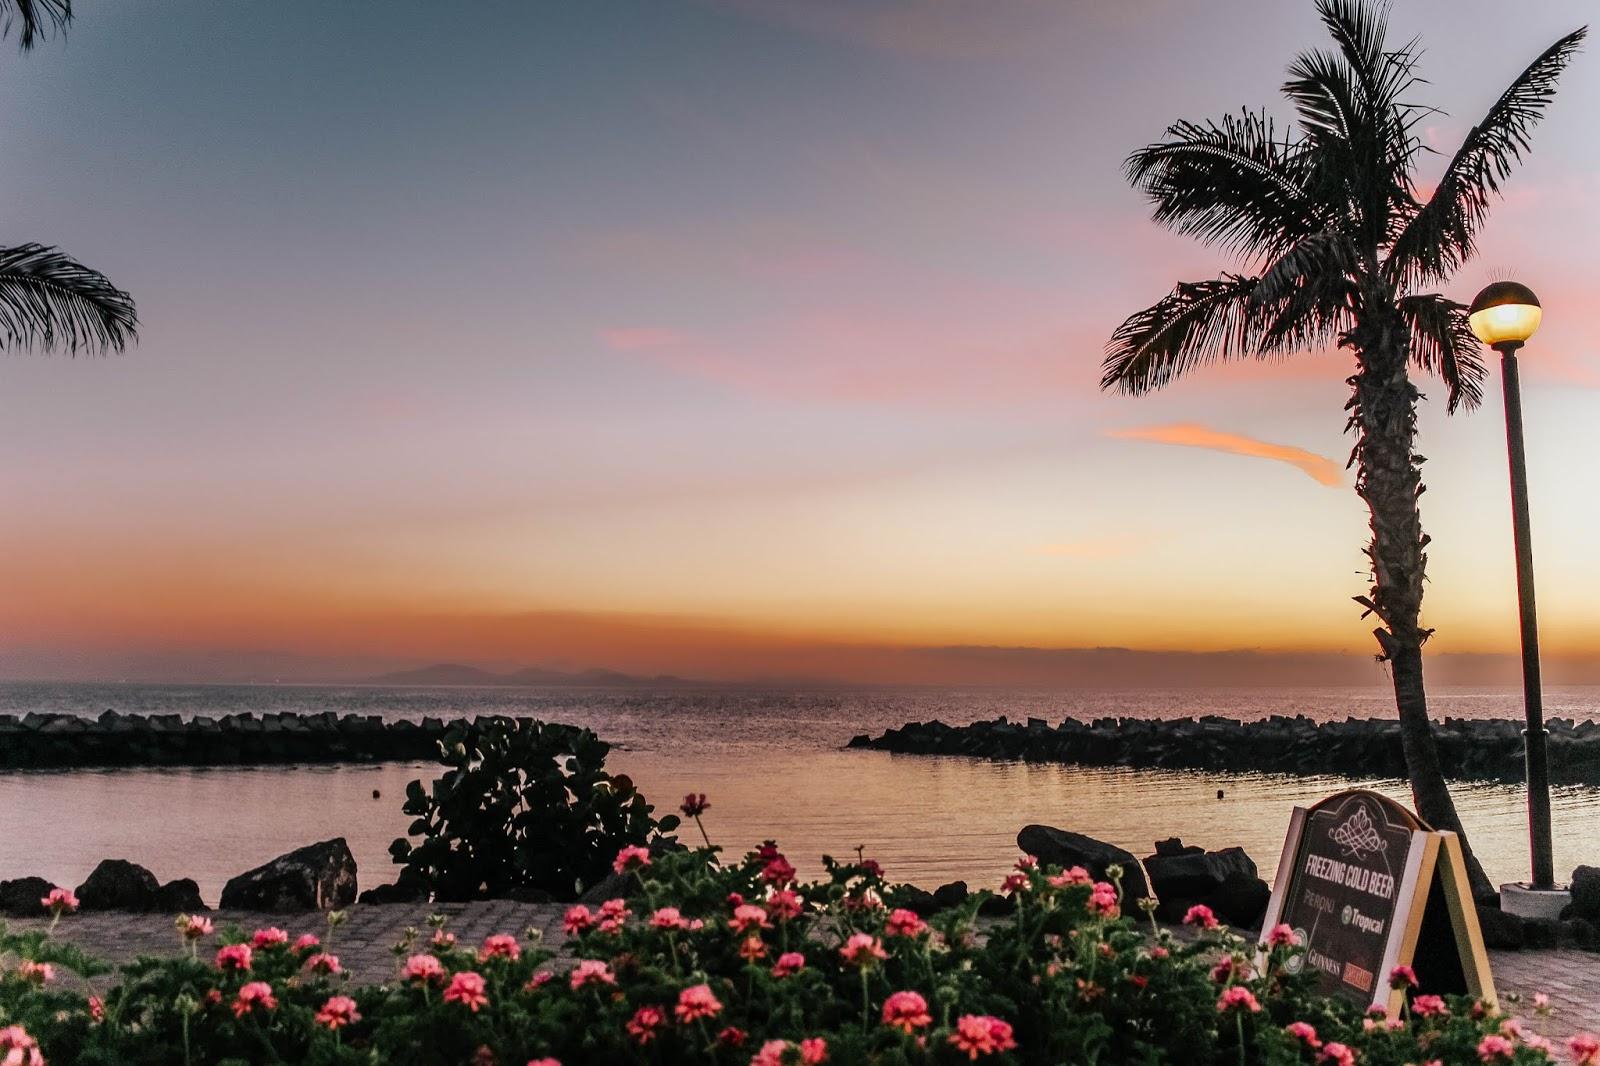 Spain Lanzarote Playa Blanca Sunset